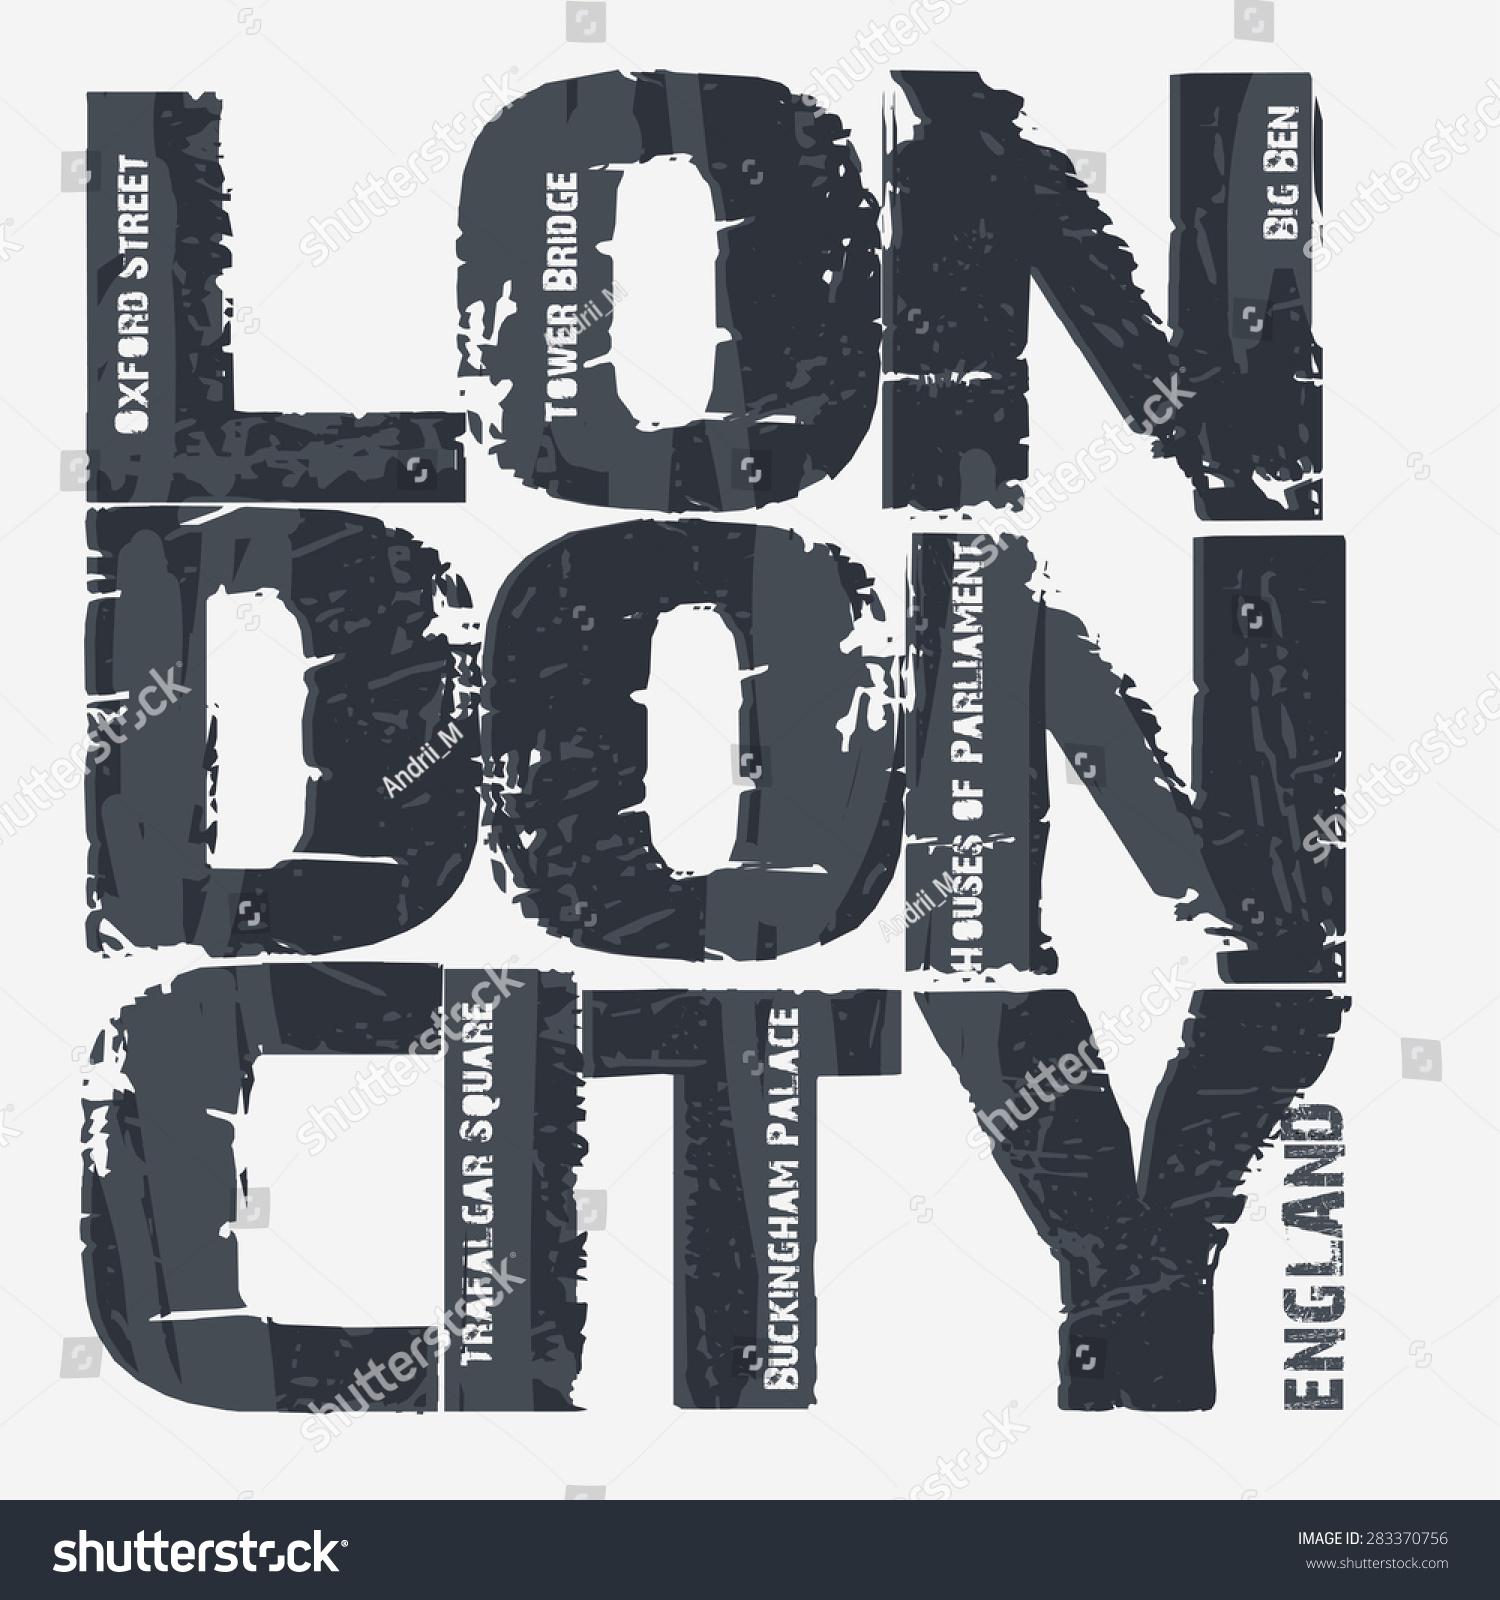 Shirt design london - London City Typography Graphics T Shirt Design England Great Britain Big